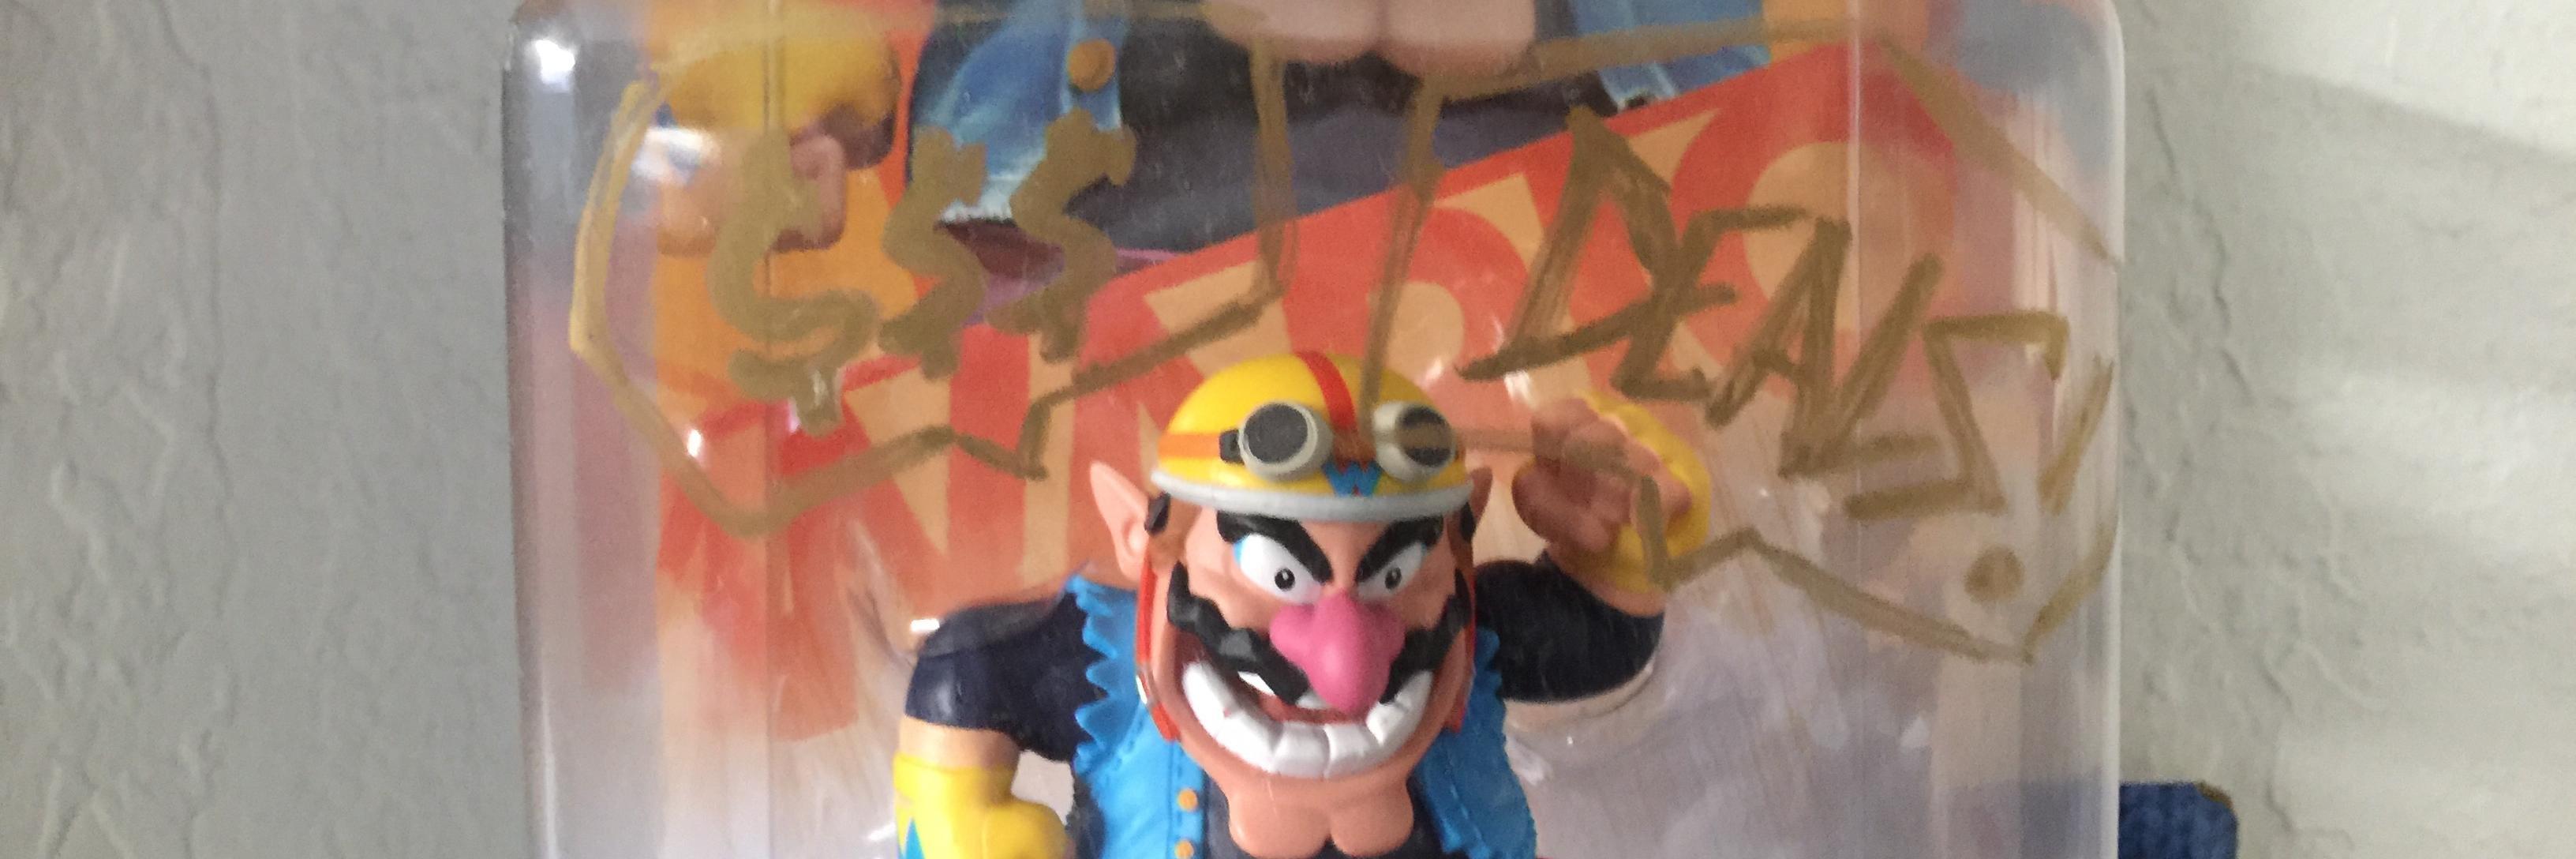 NES & Super NES - July Game Updates - Nintendo Switch Online (July 15th) youtube.com/watch?v=0Hf_0O… •Donkey Kong Coun… twitter.com/i/web/status/1…